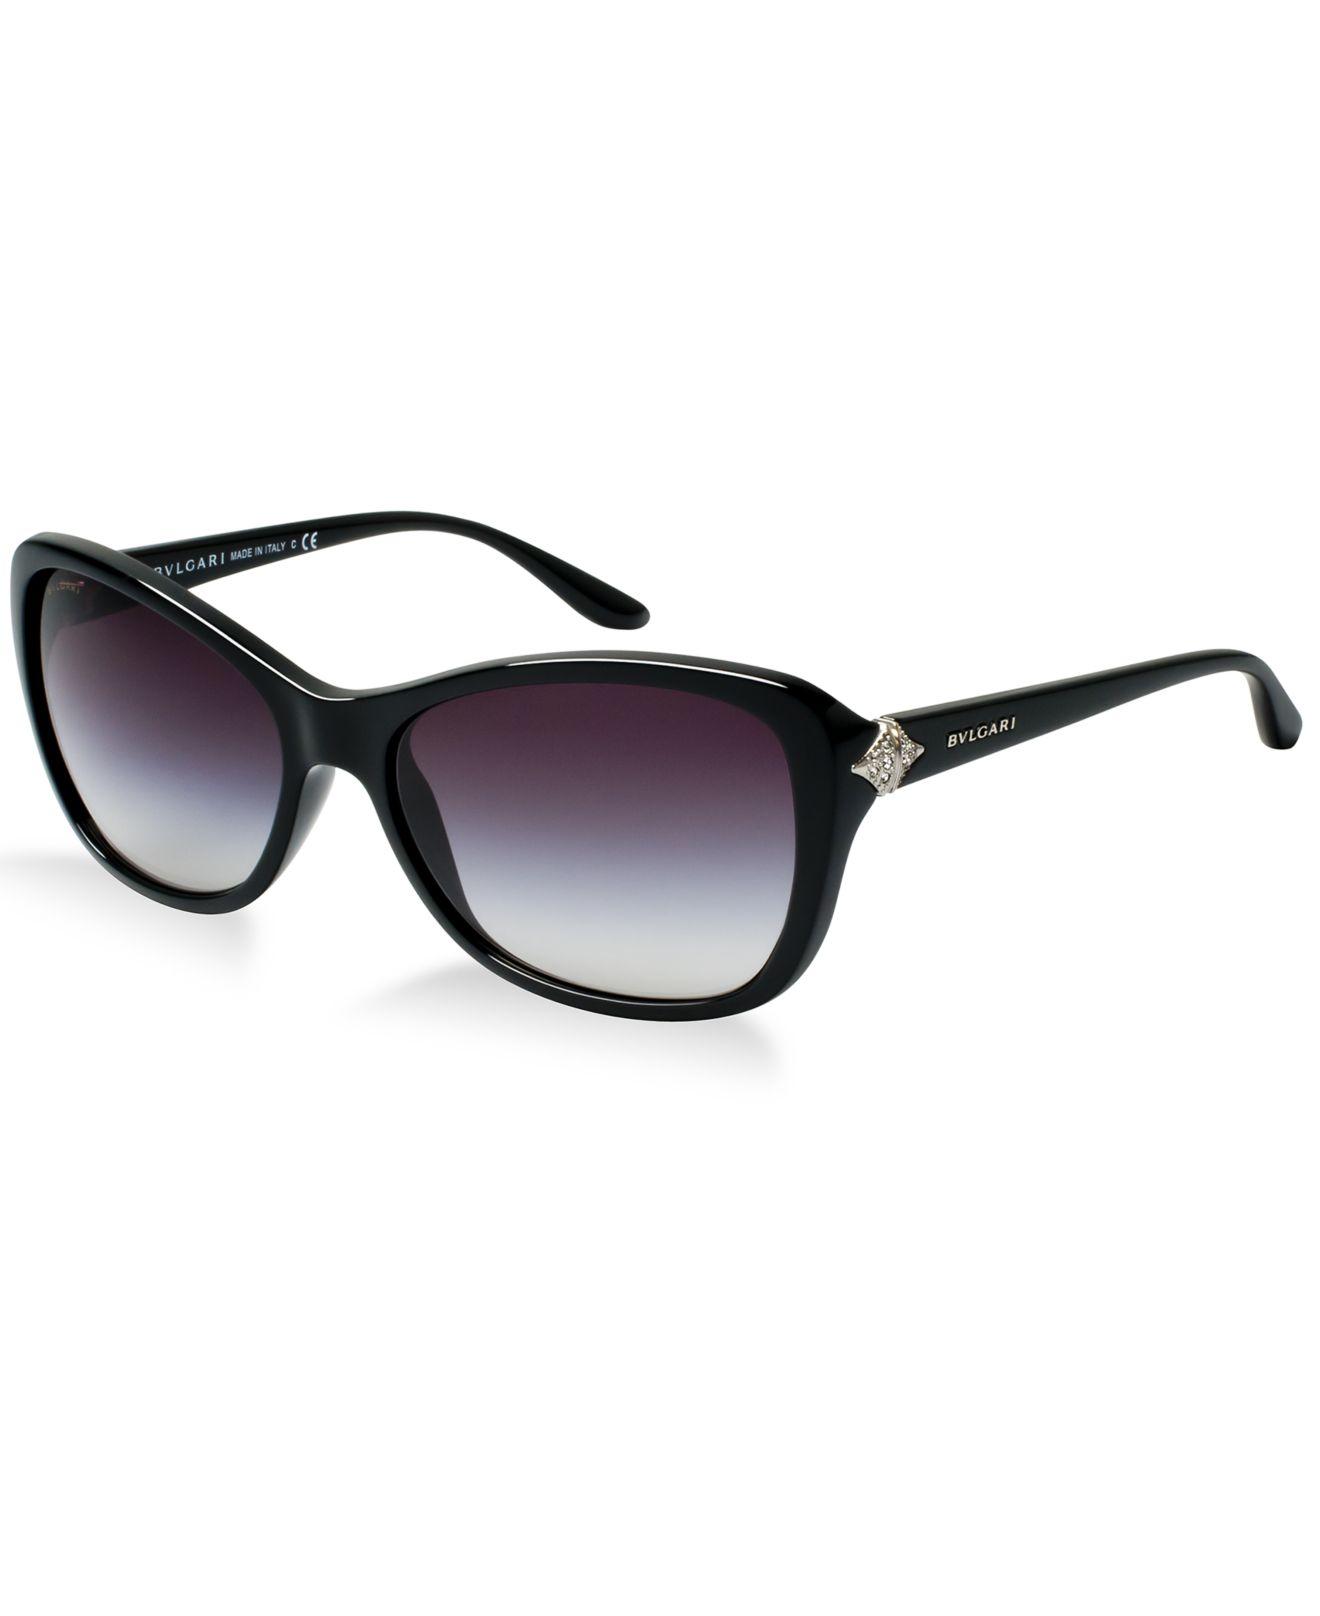 c33a25a597 Lyst - BVLGARI Sunglasses